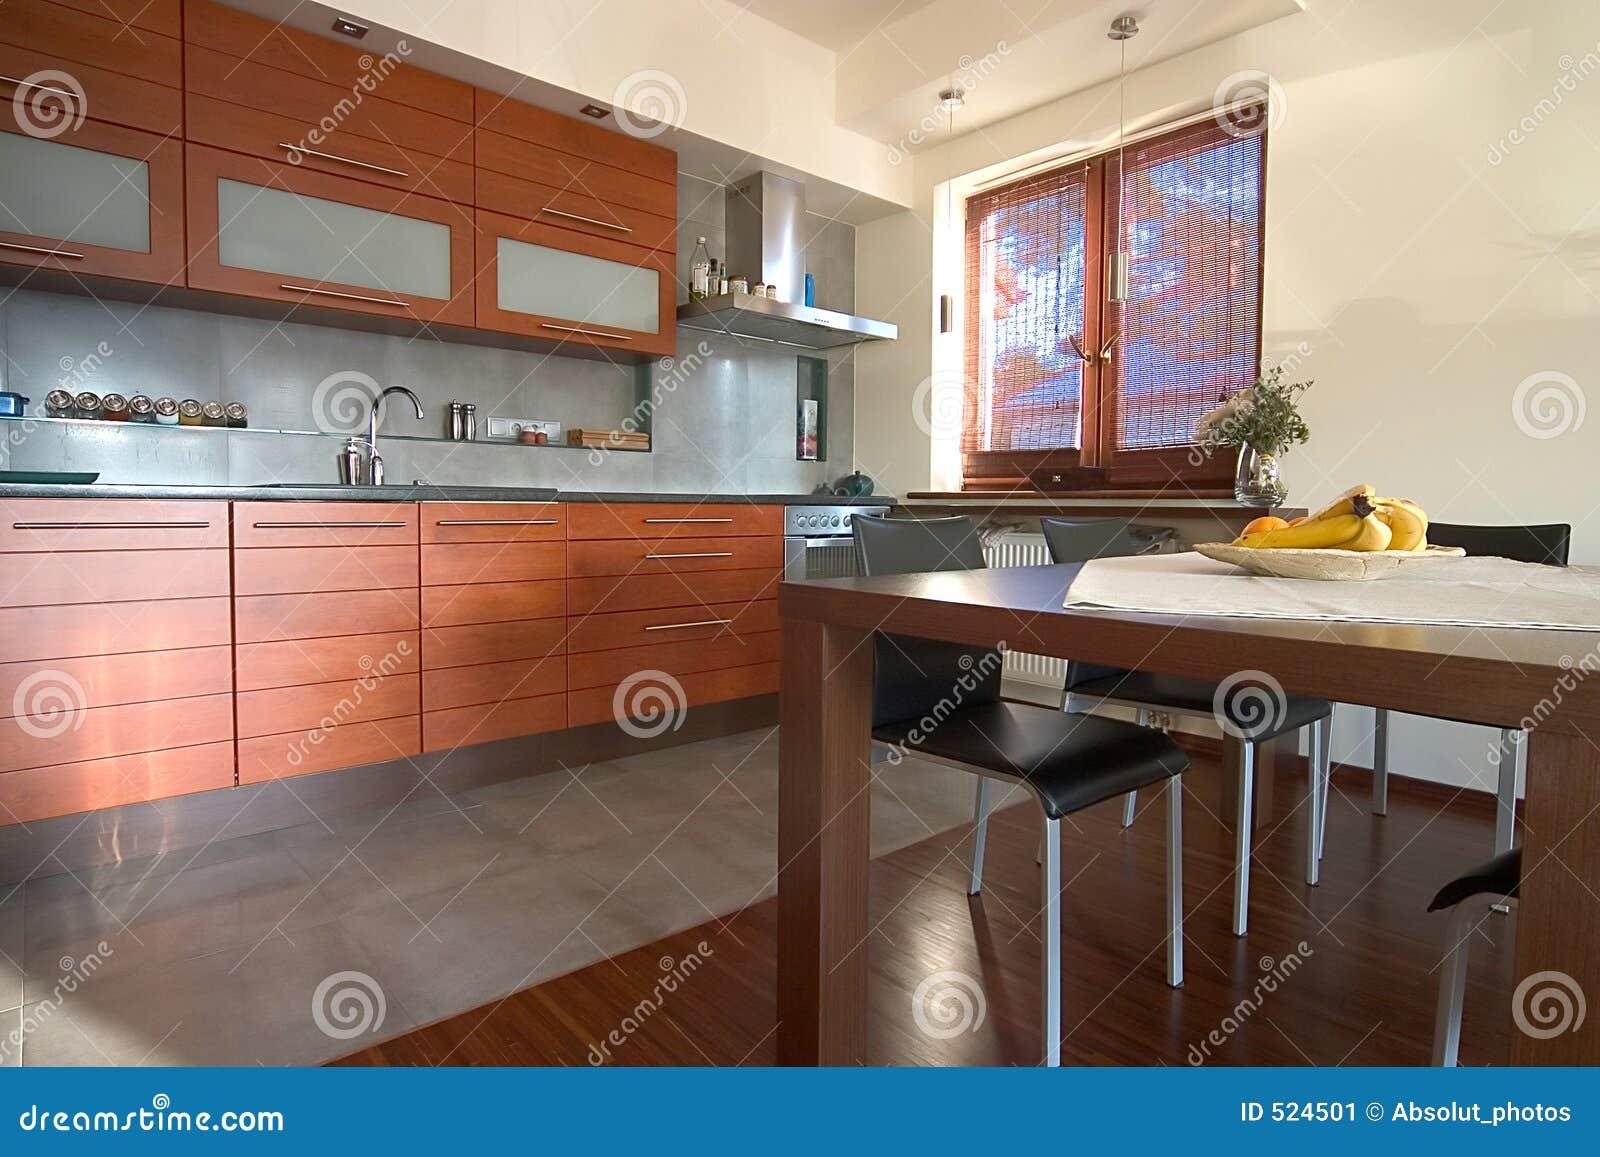 Nowoczesna Kuchnia Obraz Stock  Obraz 524501 -> Kuchnia Wloska Obrazy